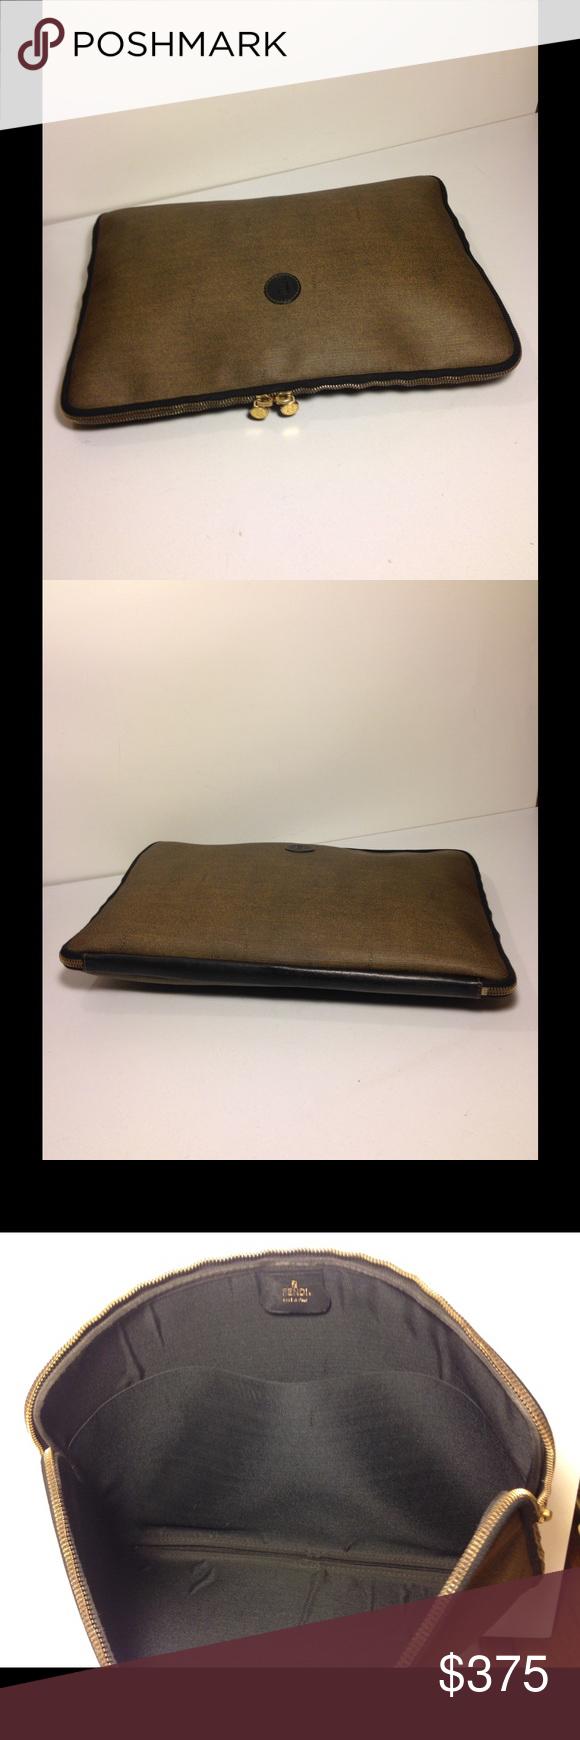 e5231c0b76e6 Selling this Fendi Vintage Briefcase File Attache Laptop Bag on Poshmark!  My username is  deepeevintage.  shopmycloset  poshmark  fashion  shopping   style ...